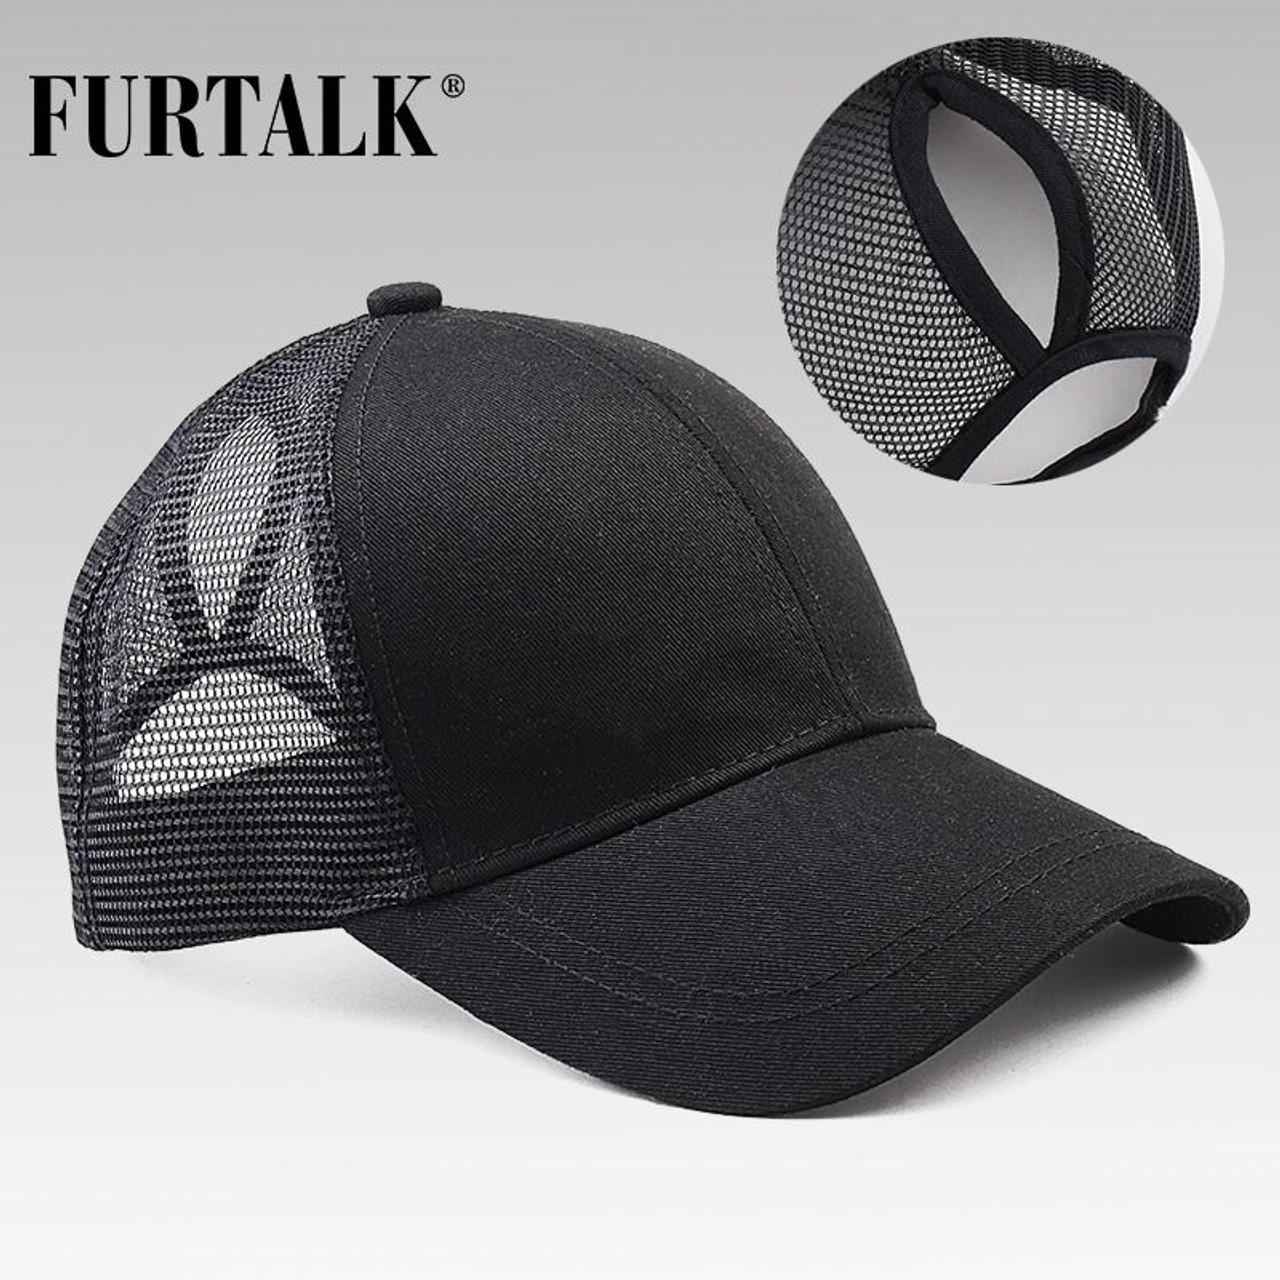 21b4418817a ... FURTALK 2018 Ponytail Baseball Cap Women Messy Bun Baseball Hat Snapback  ...